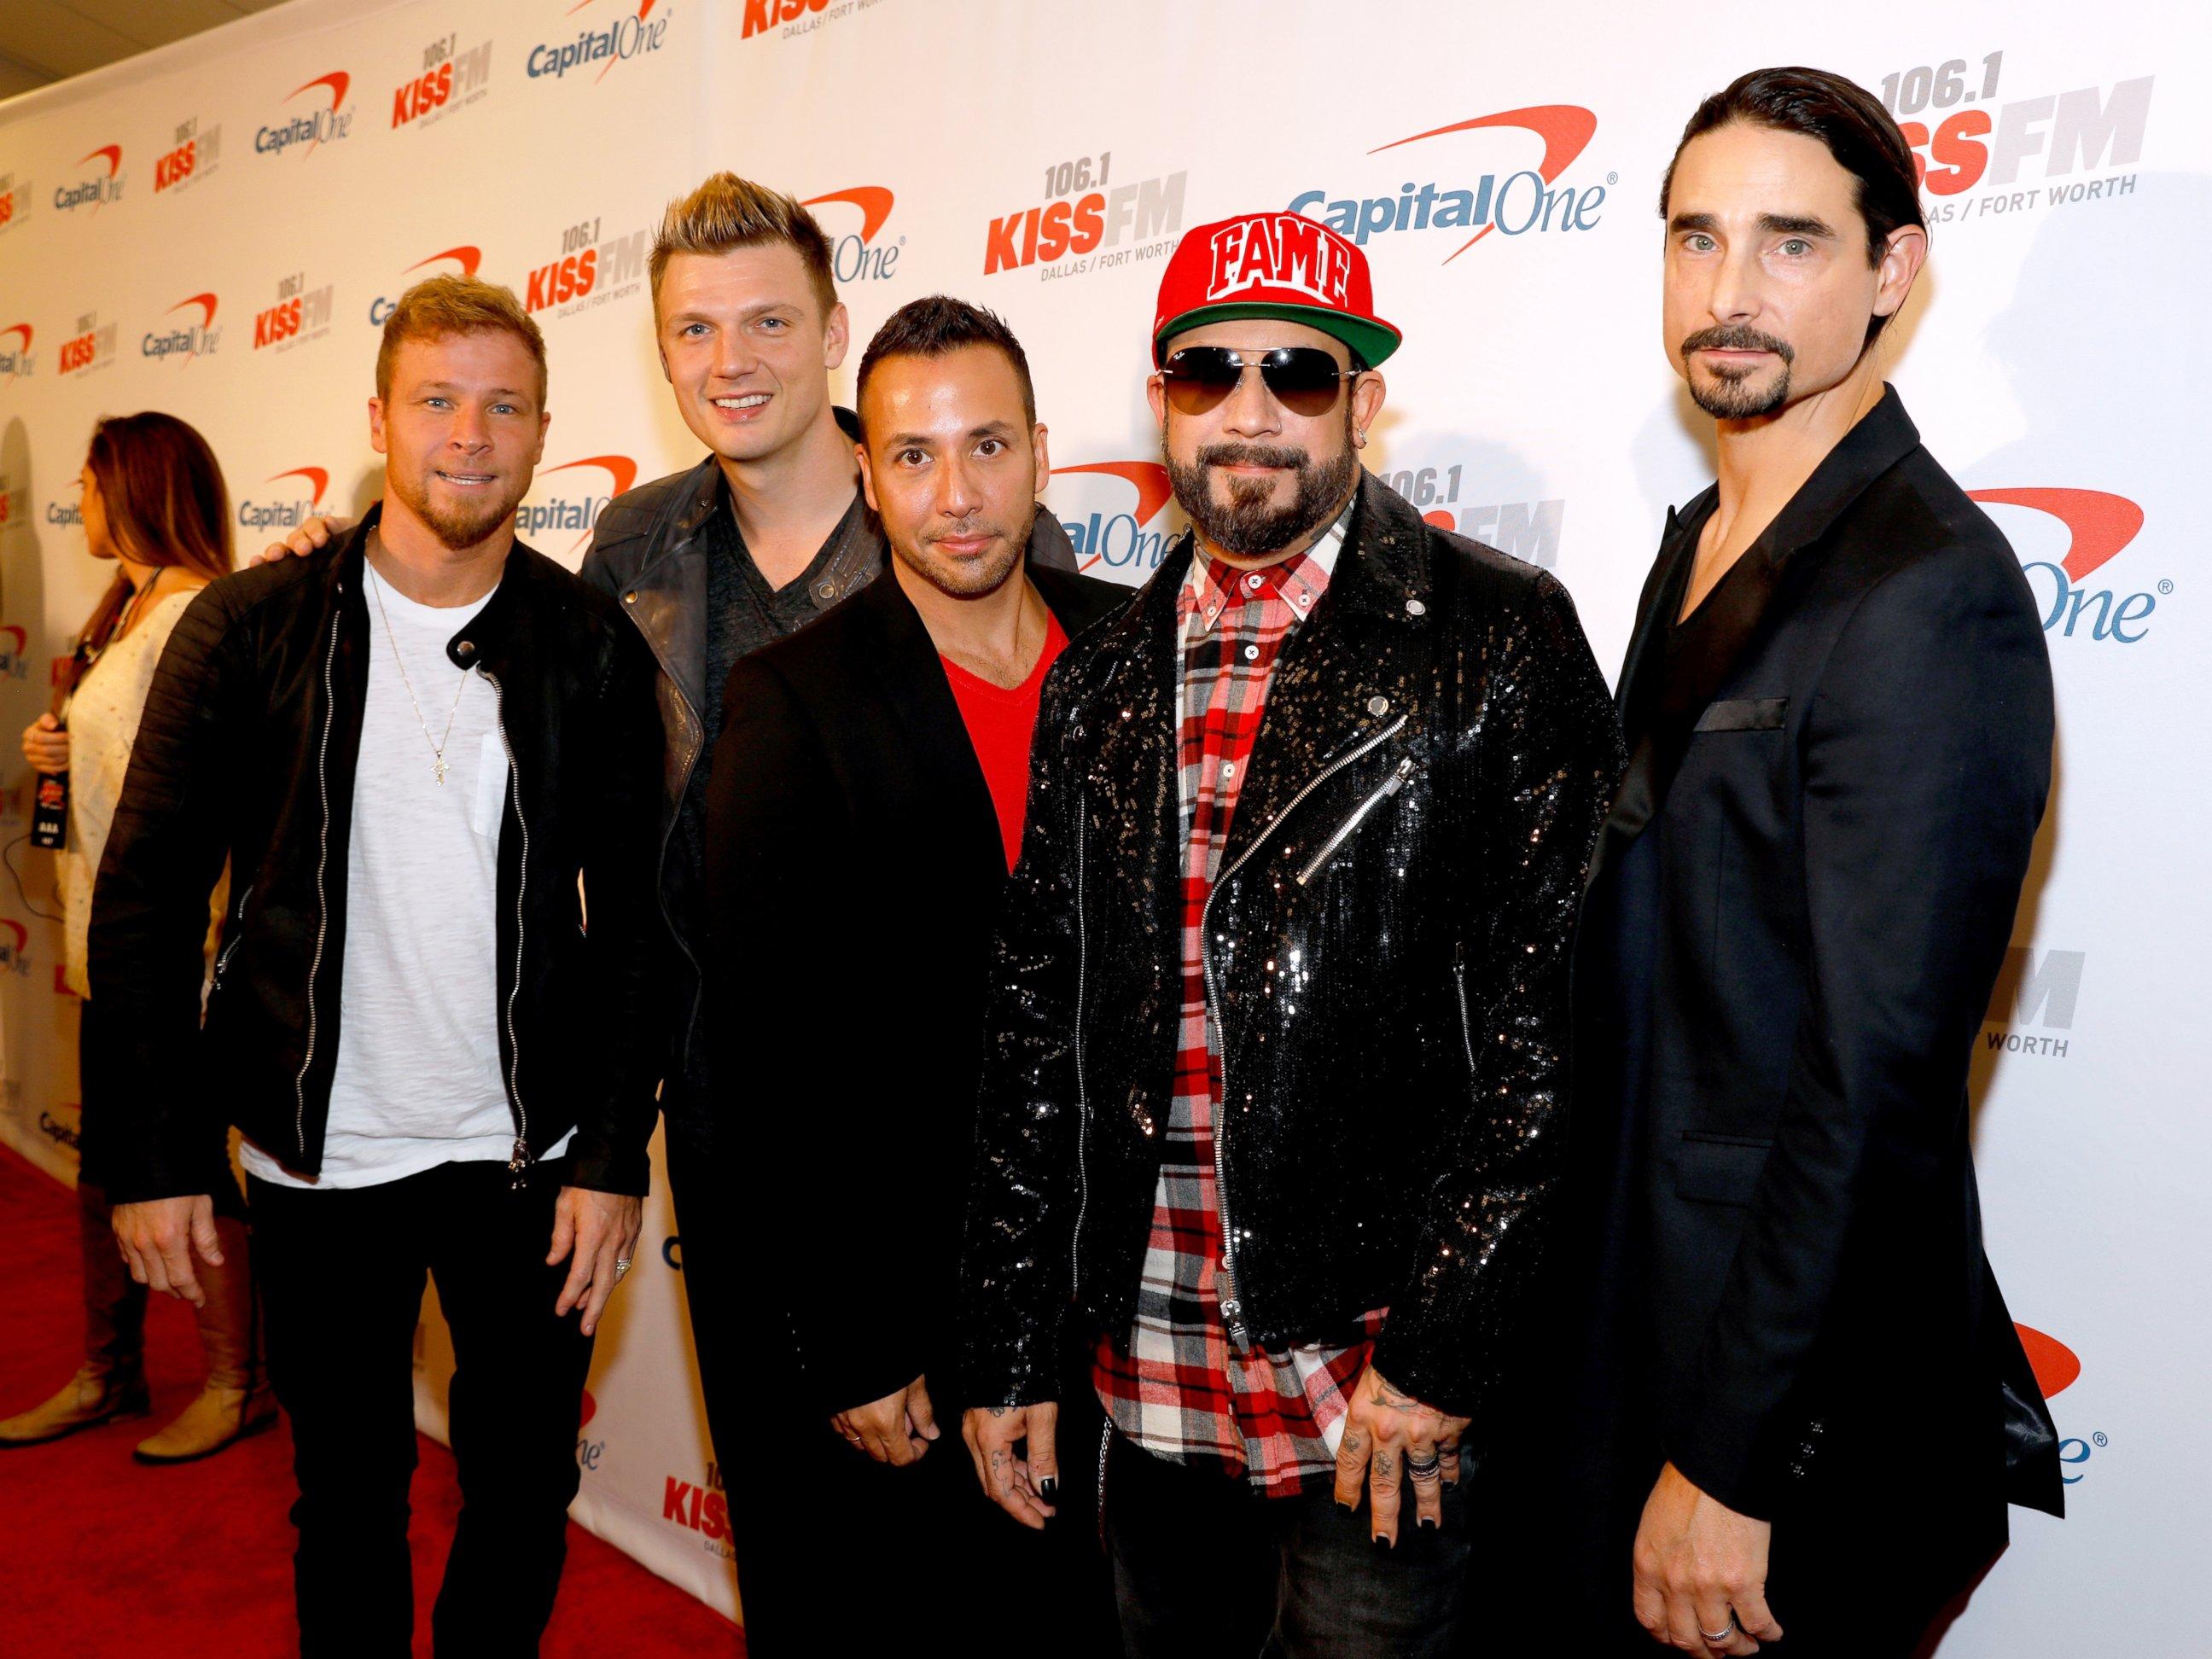 Backstreet Boys Videos at ABC News Video Archive at abcnews.com